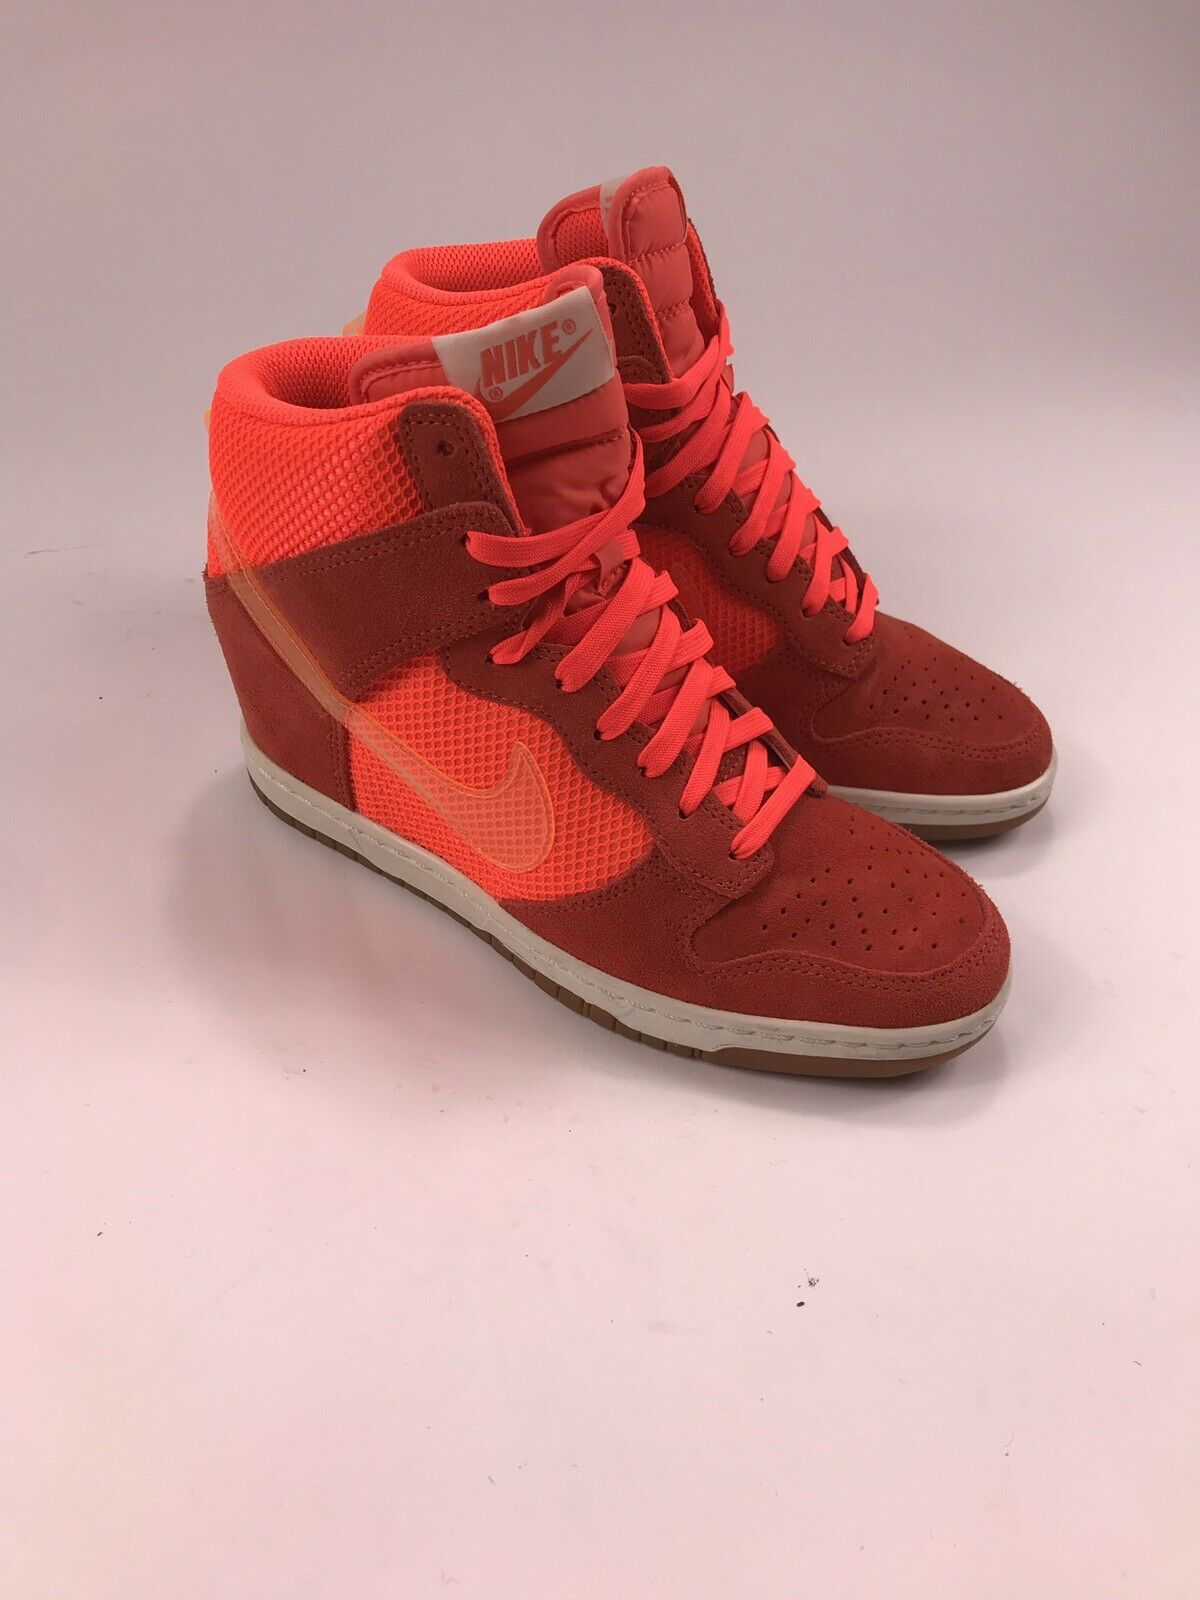 best service 806cb 3cbf5 Nike Nike Nike 579763-800 Women s Sky Hi Mesh Total Crimson Mango Sail  Wedge Sz